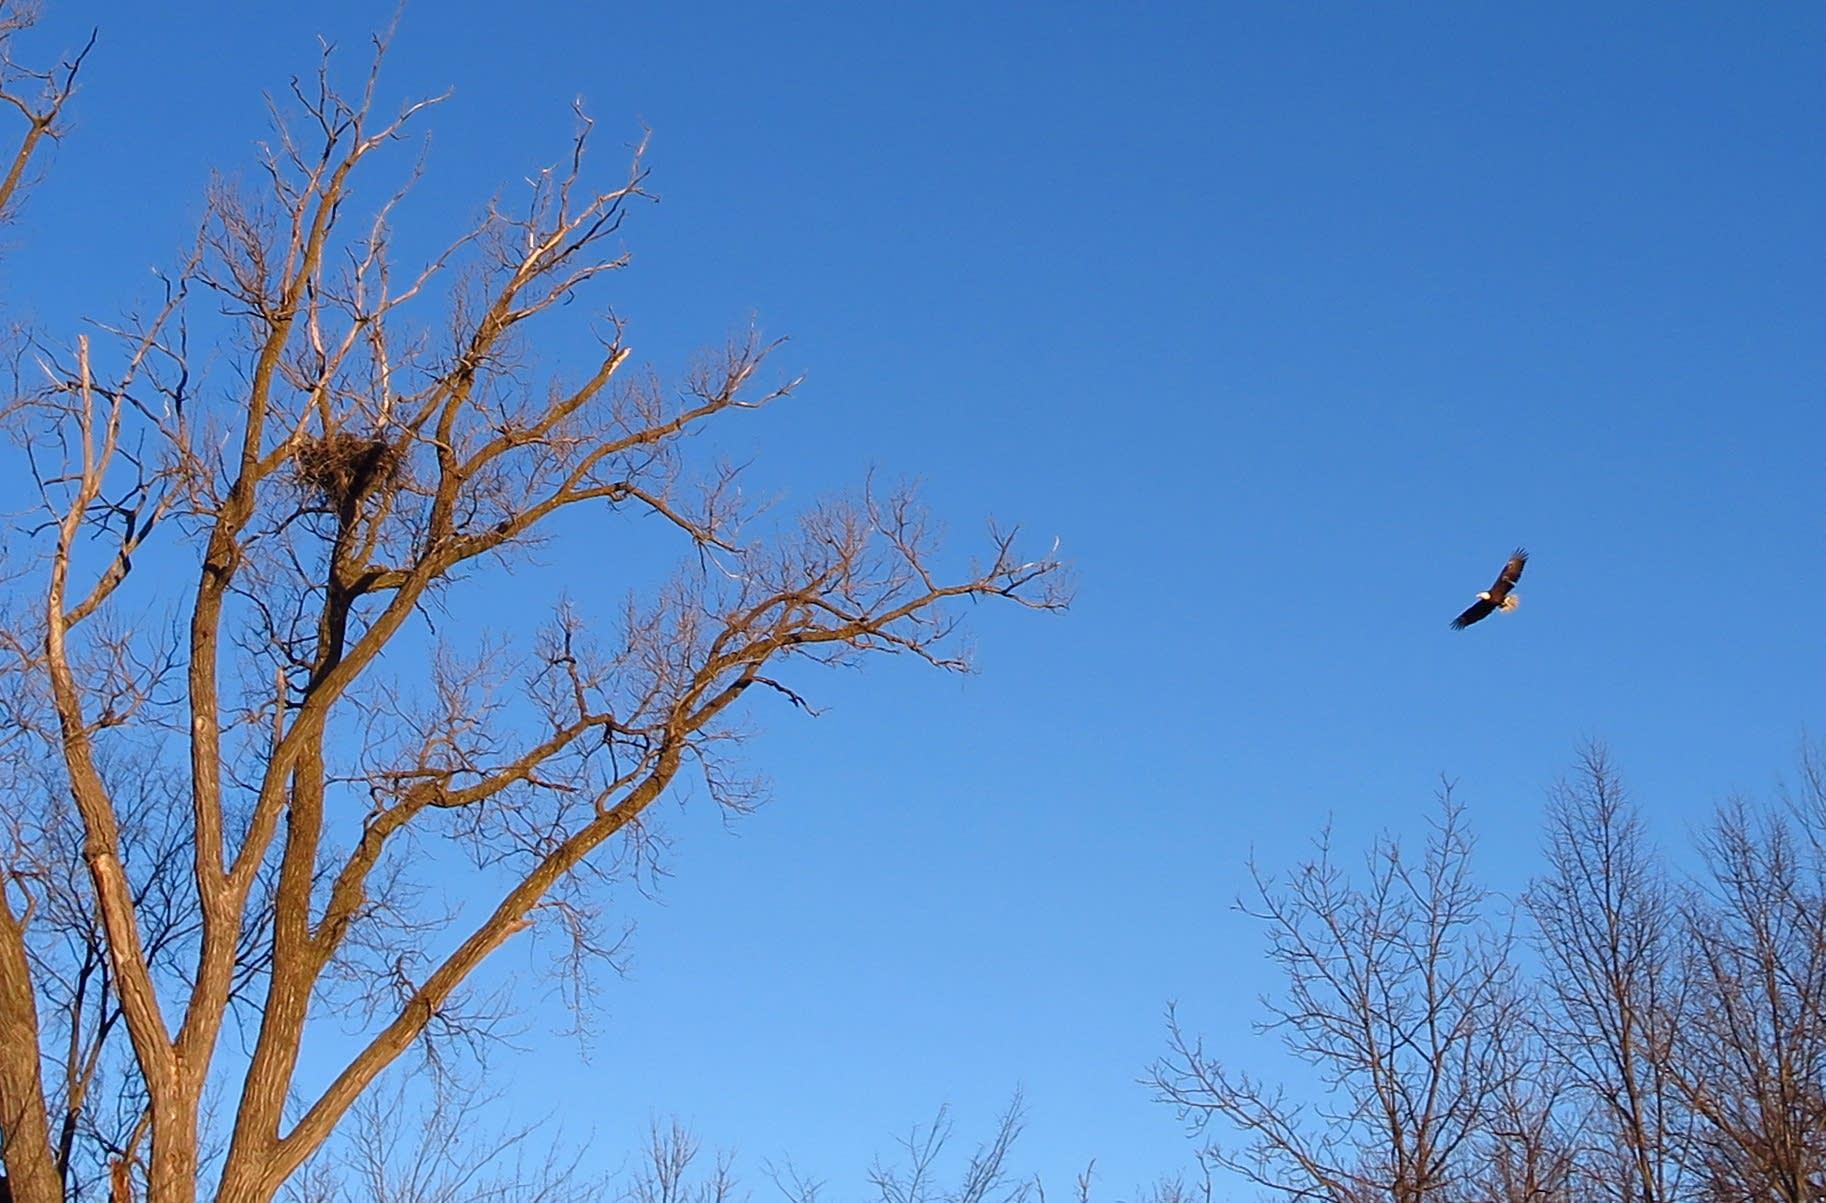 An eagle circles the nest.